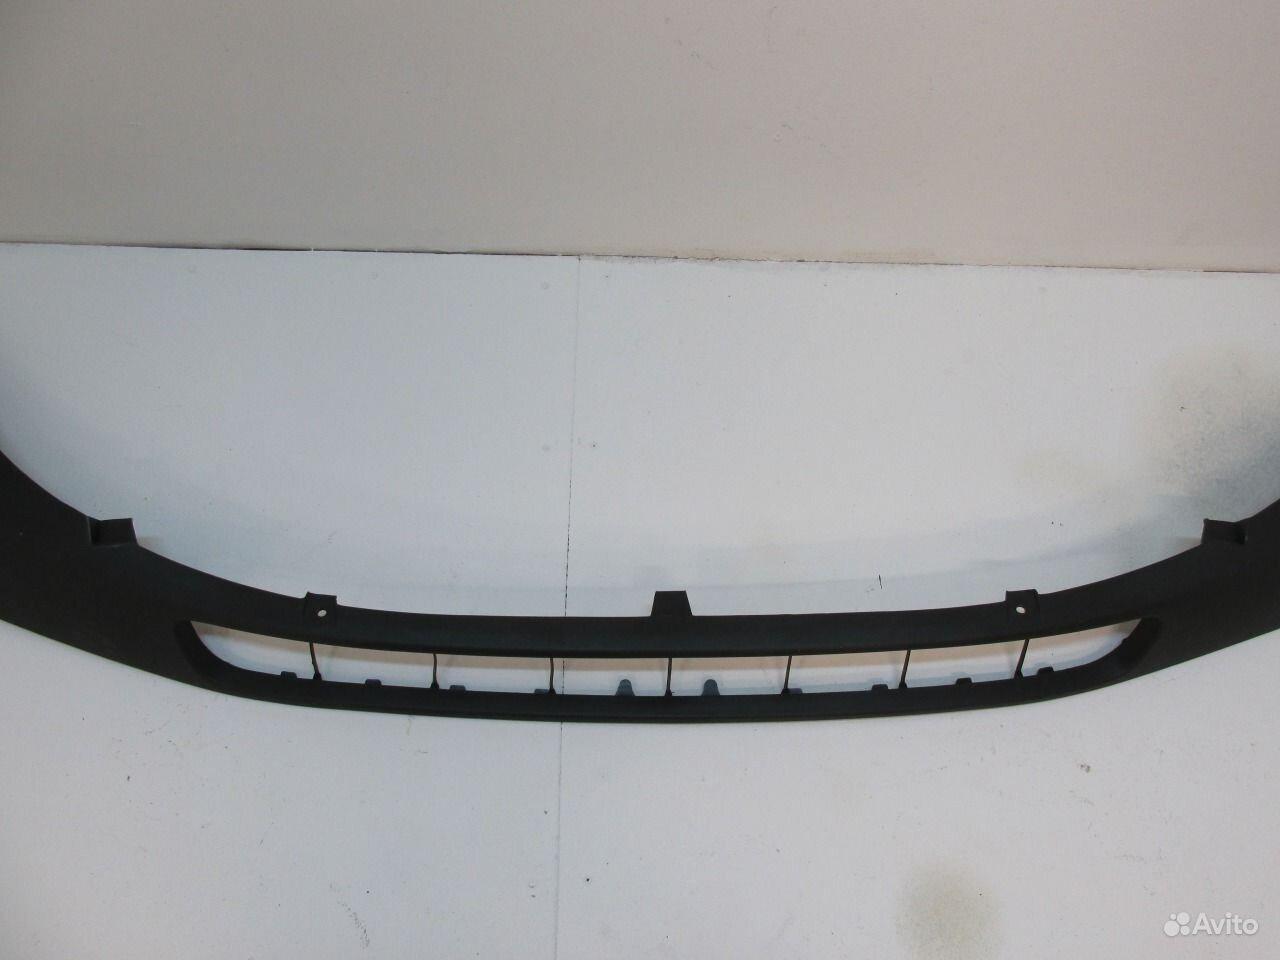 Замена Юбки Переднего Бампера Форд Фокус 2 Хечбек